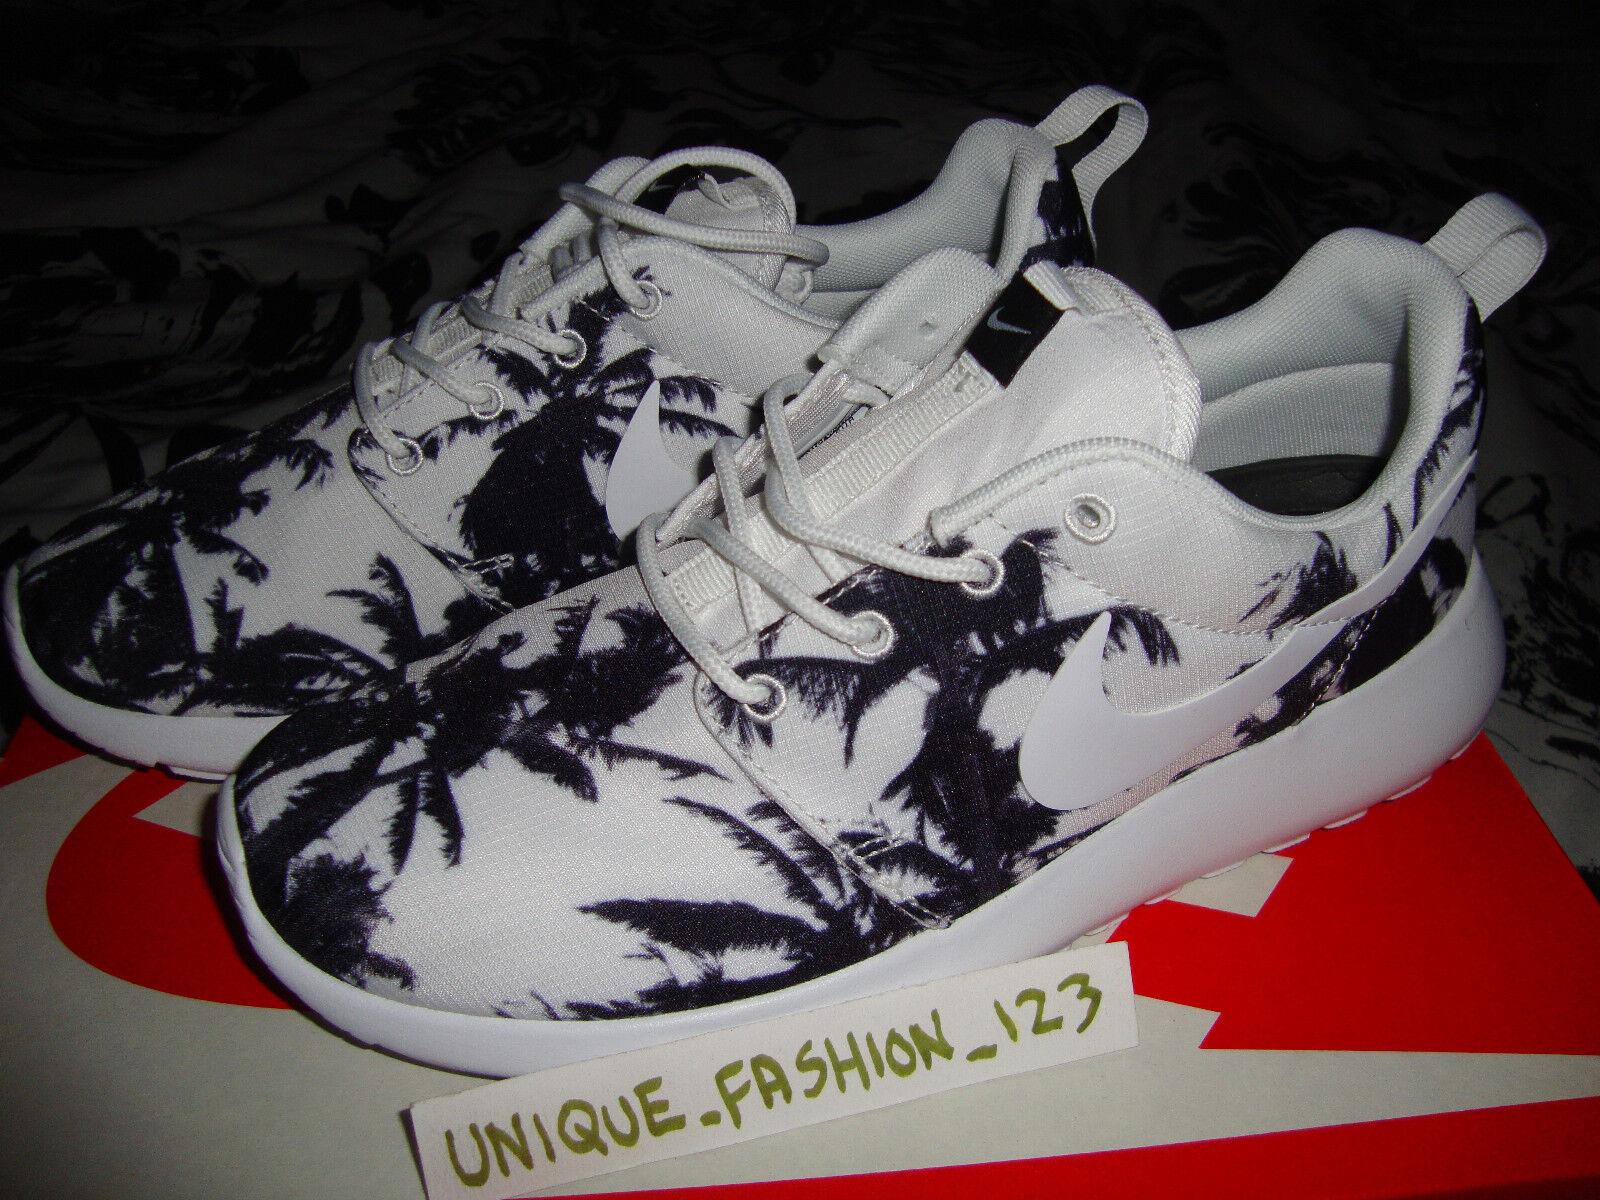 Wmns Nike Rosherun Roshe Palmera EE. UU. 8 Reino Unido 5.5 39 Santa Monica árboles Qs